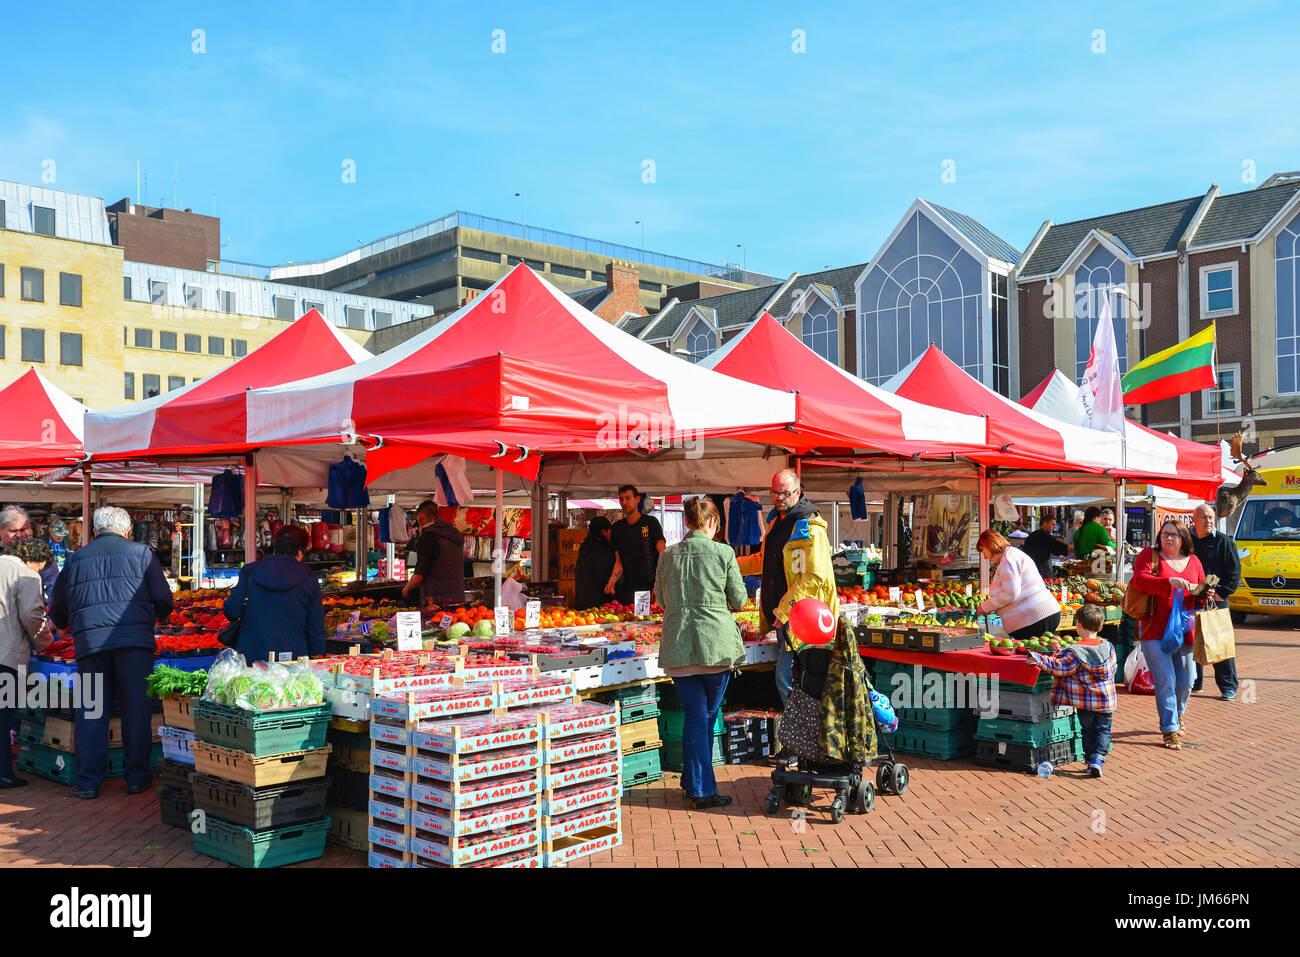 Northampton Market, The Market Square, Northampton, Northamptonshire, England, United Kingdom - Stock Image